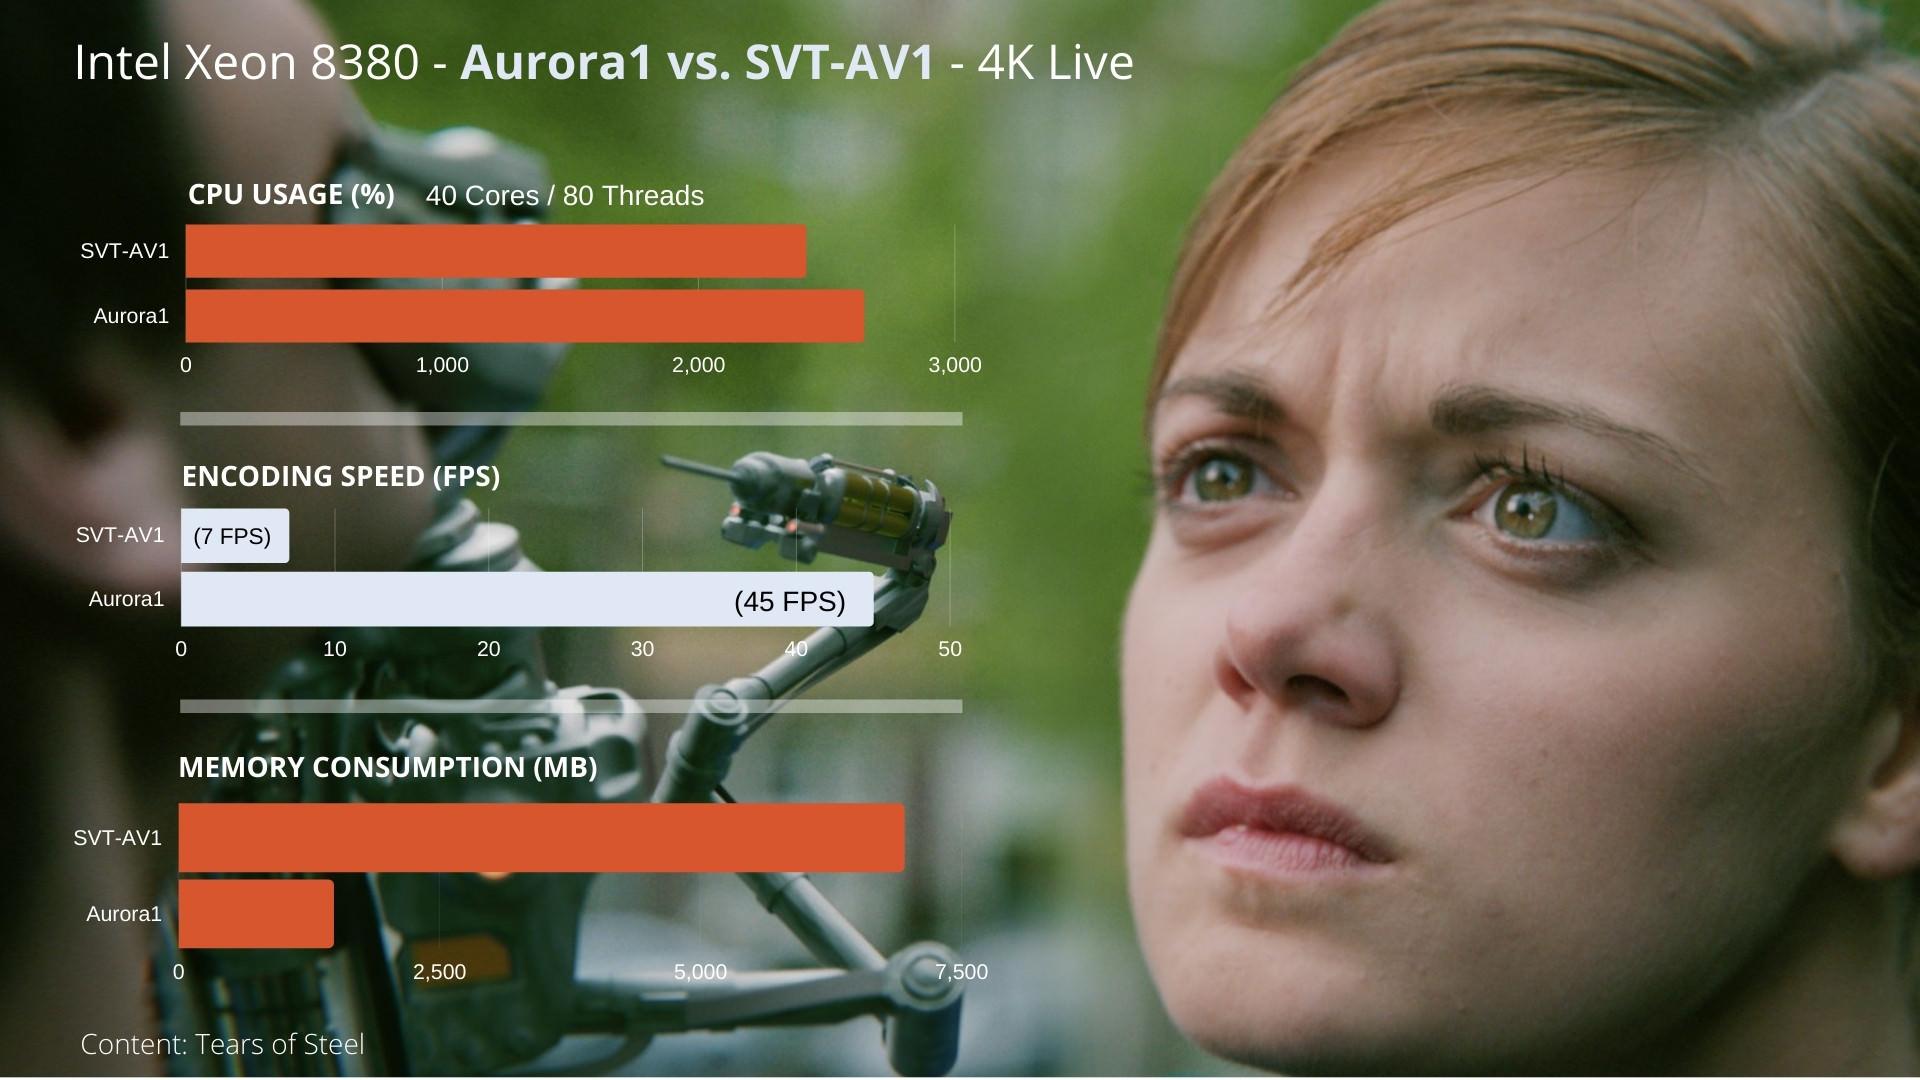 intel xeon 8380 aurora1 vs svt-av1 4k live